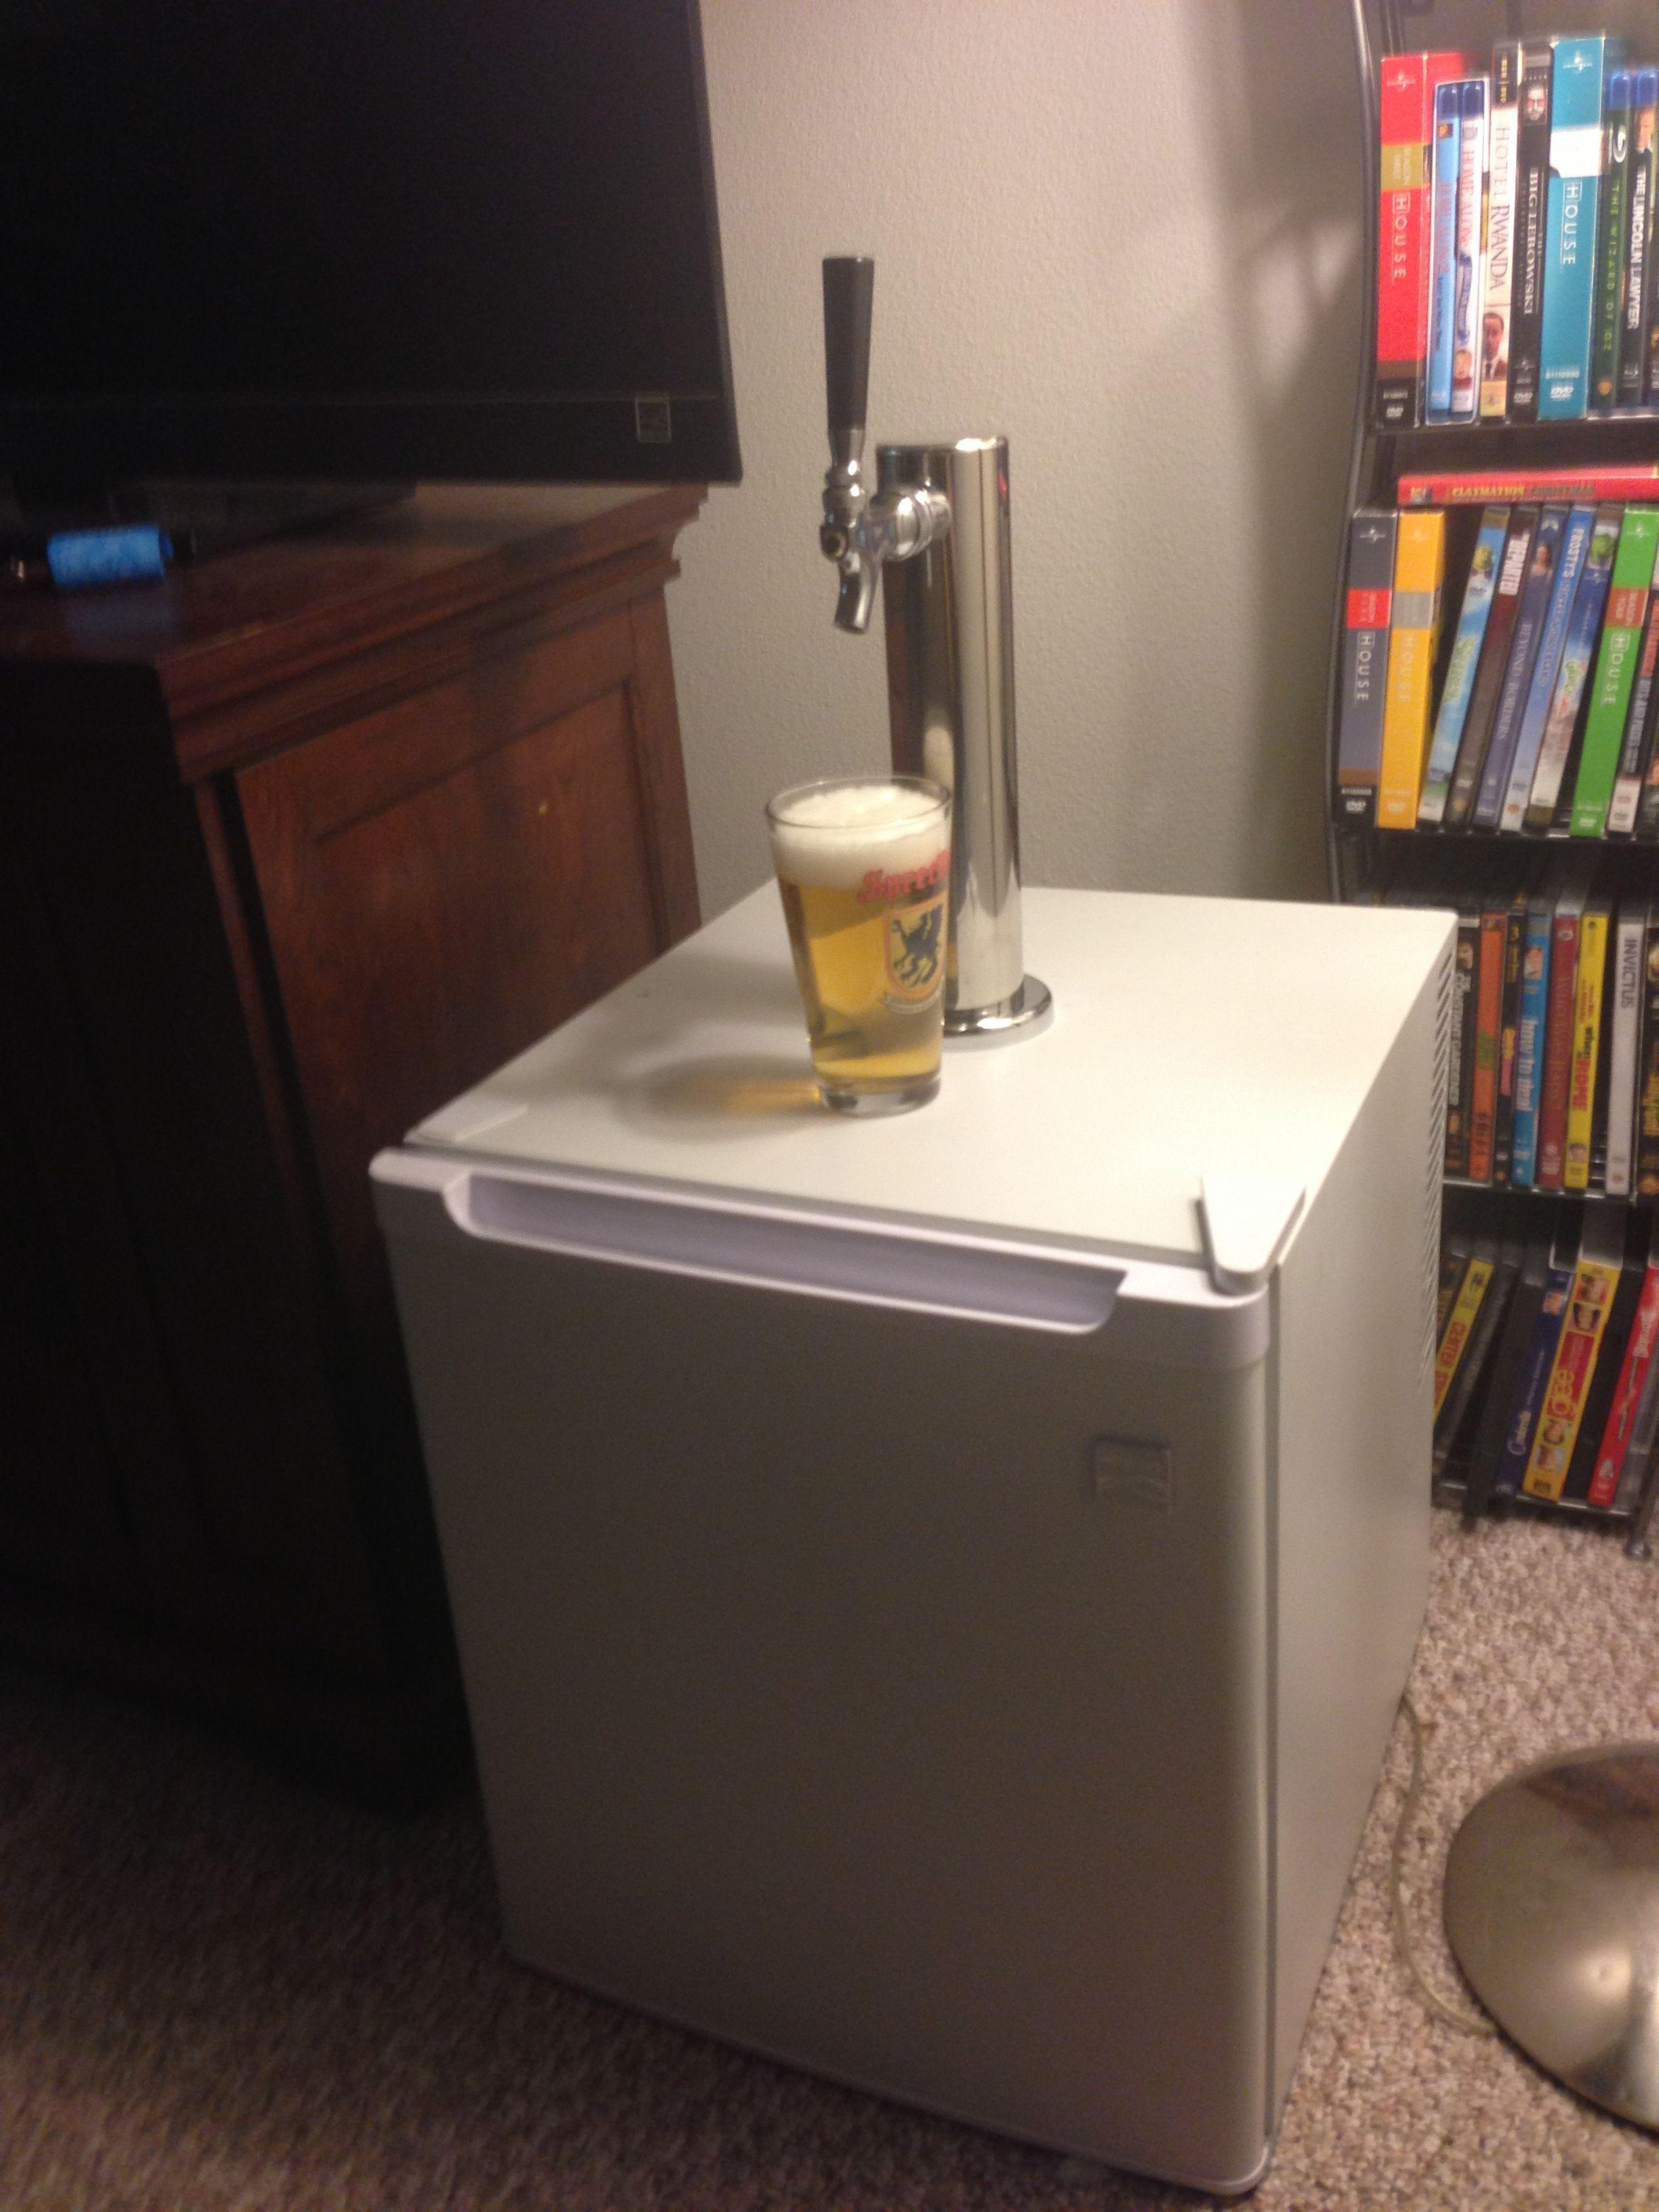 $75 Homemade mini kegerator built using $15 Kenmore (clearance) mini fridge and a $50 eBay beer faucet . Uses Heineken mini kegs.